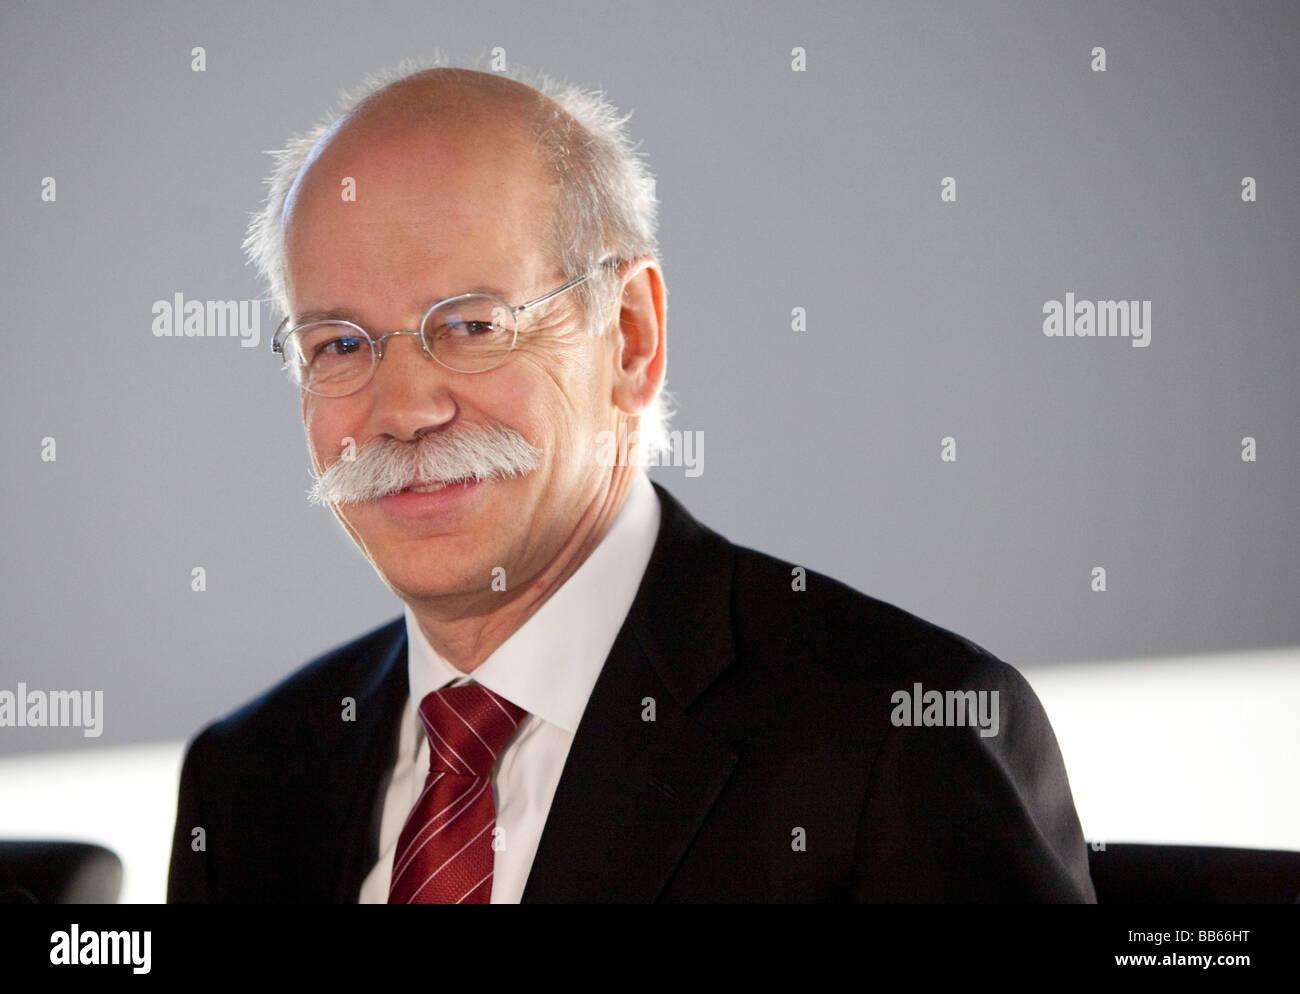 Dieter ZETSCHE CEO of Daimler AG - Stock Image